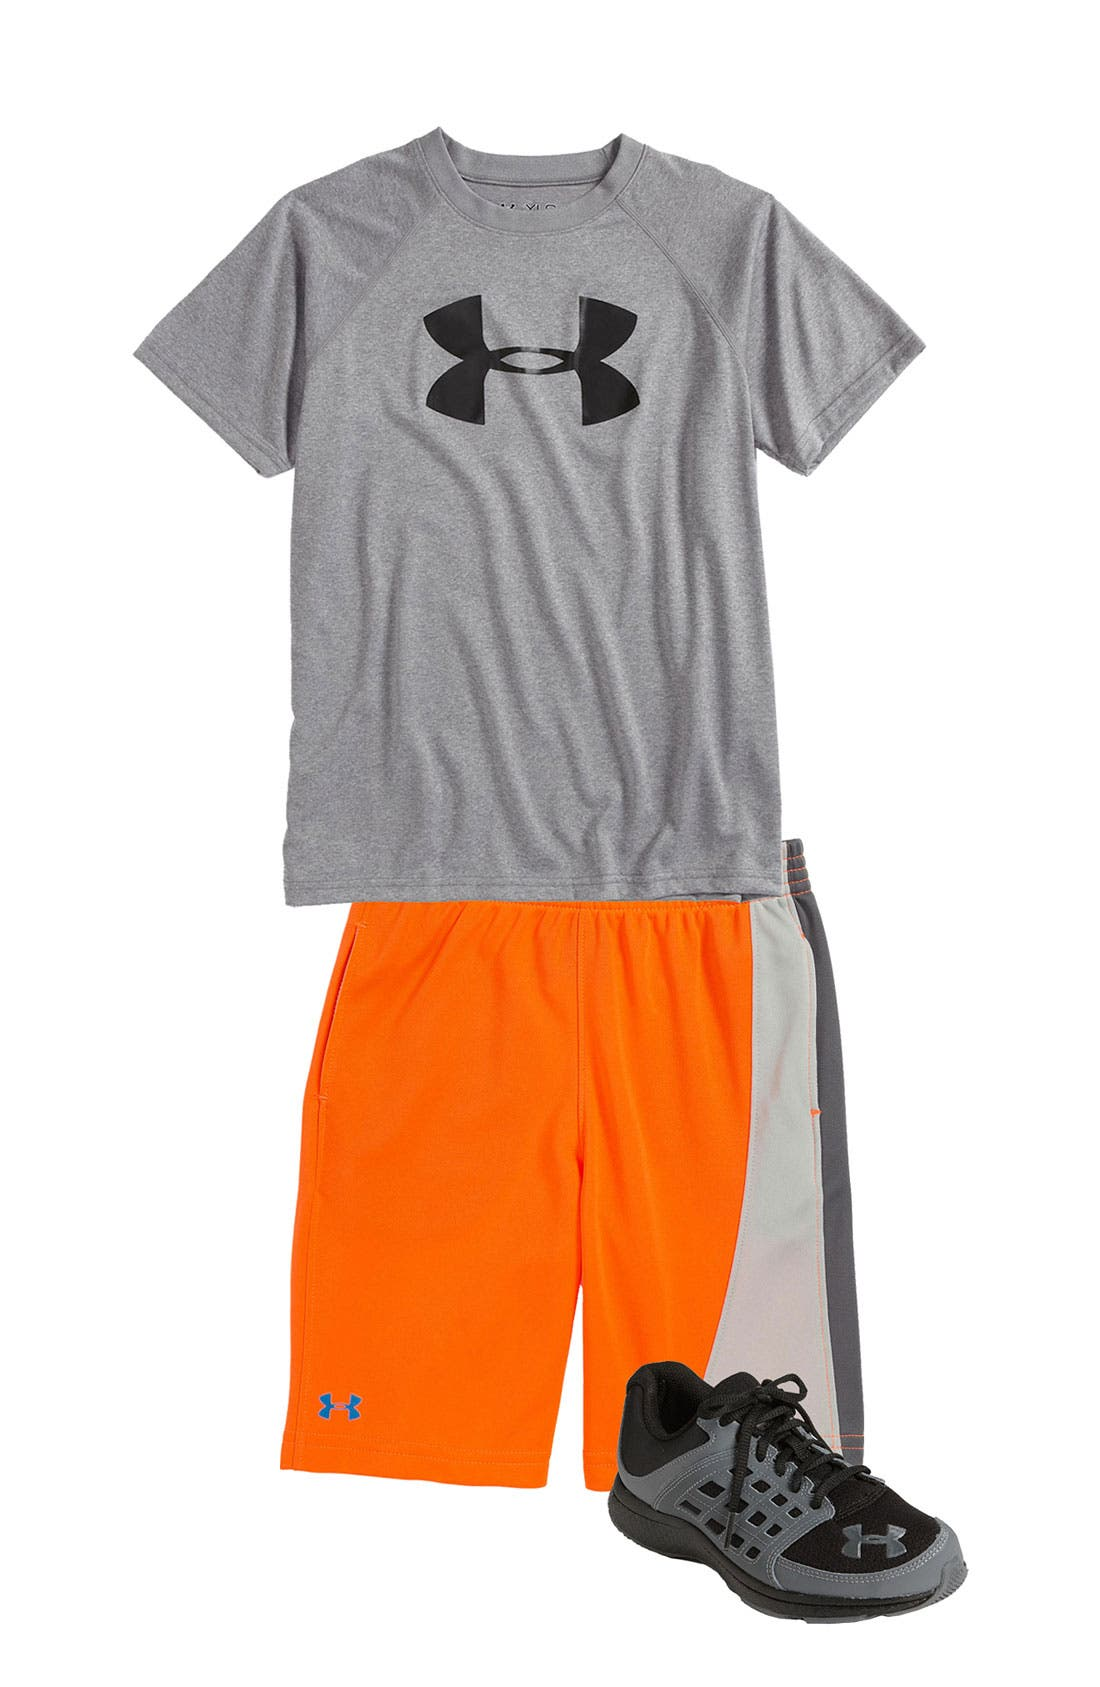 Main Image - Under Armour T-Shirt, Shorts & Sneaker (Little Boys)